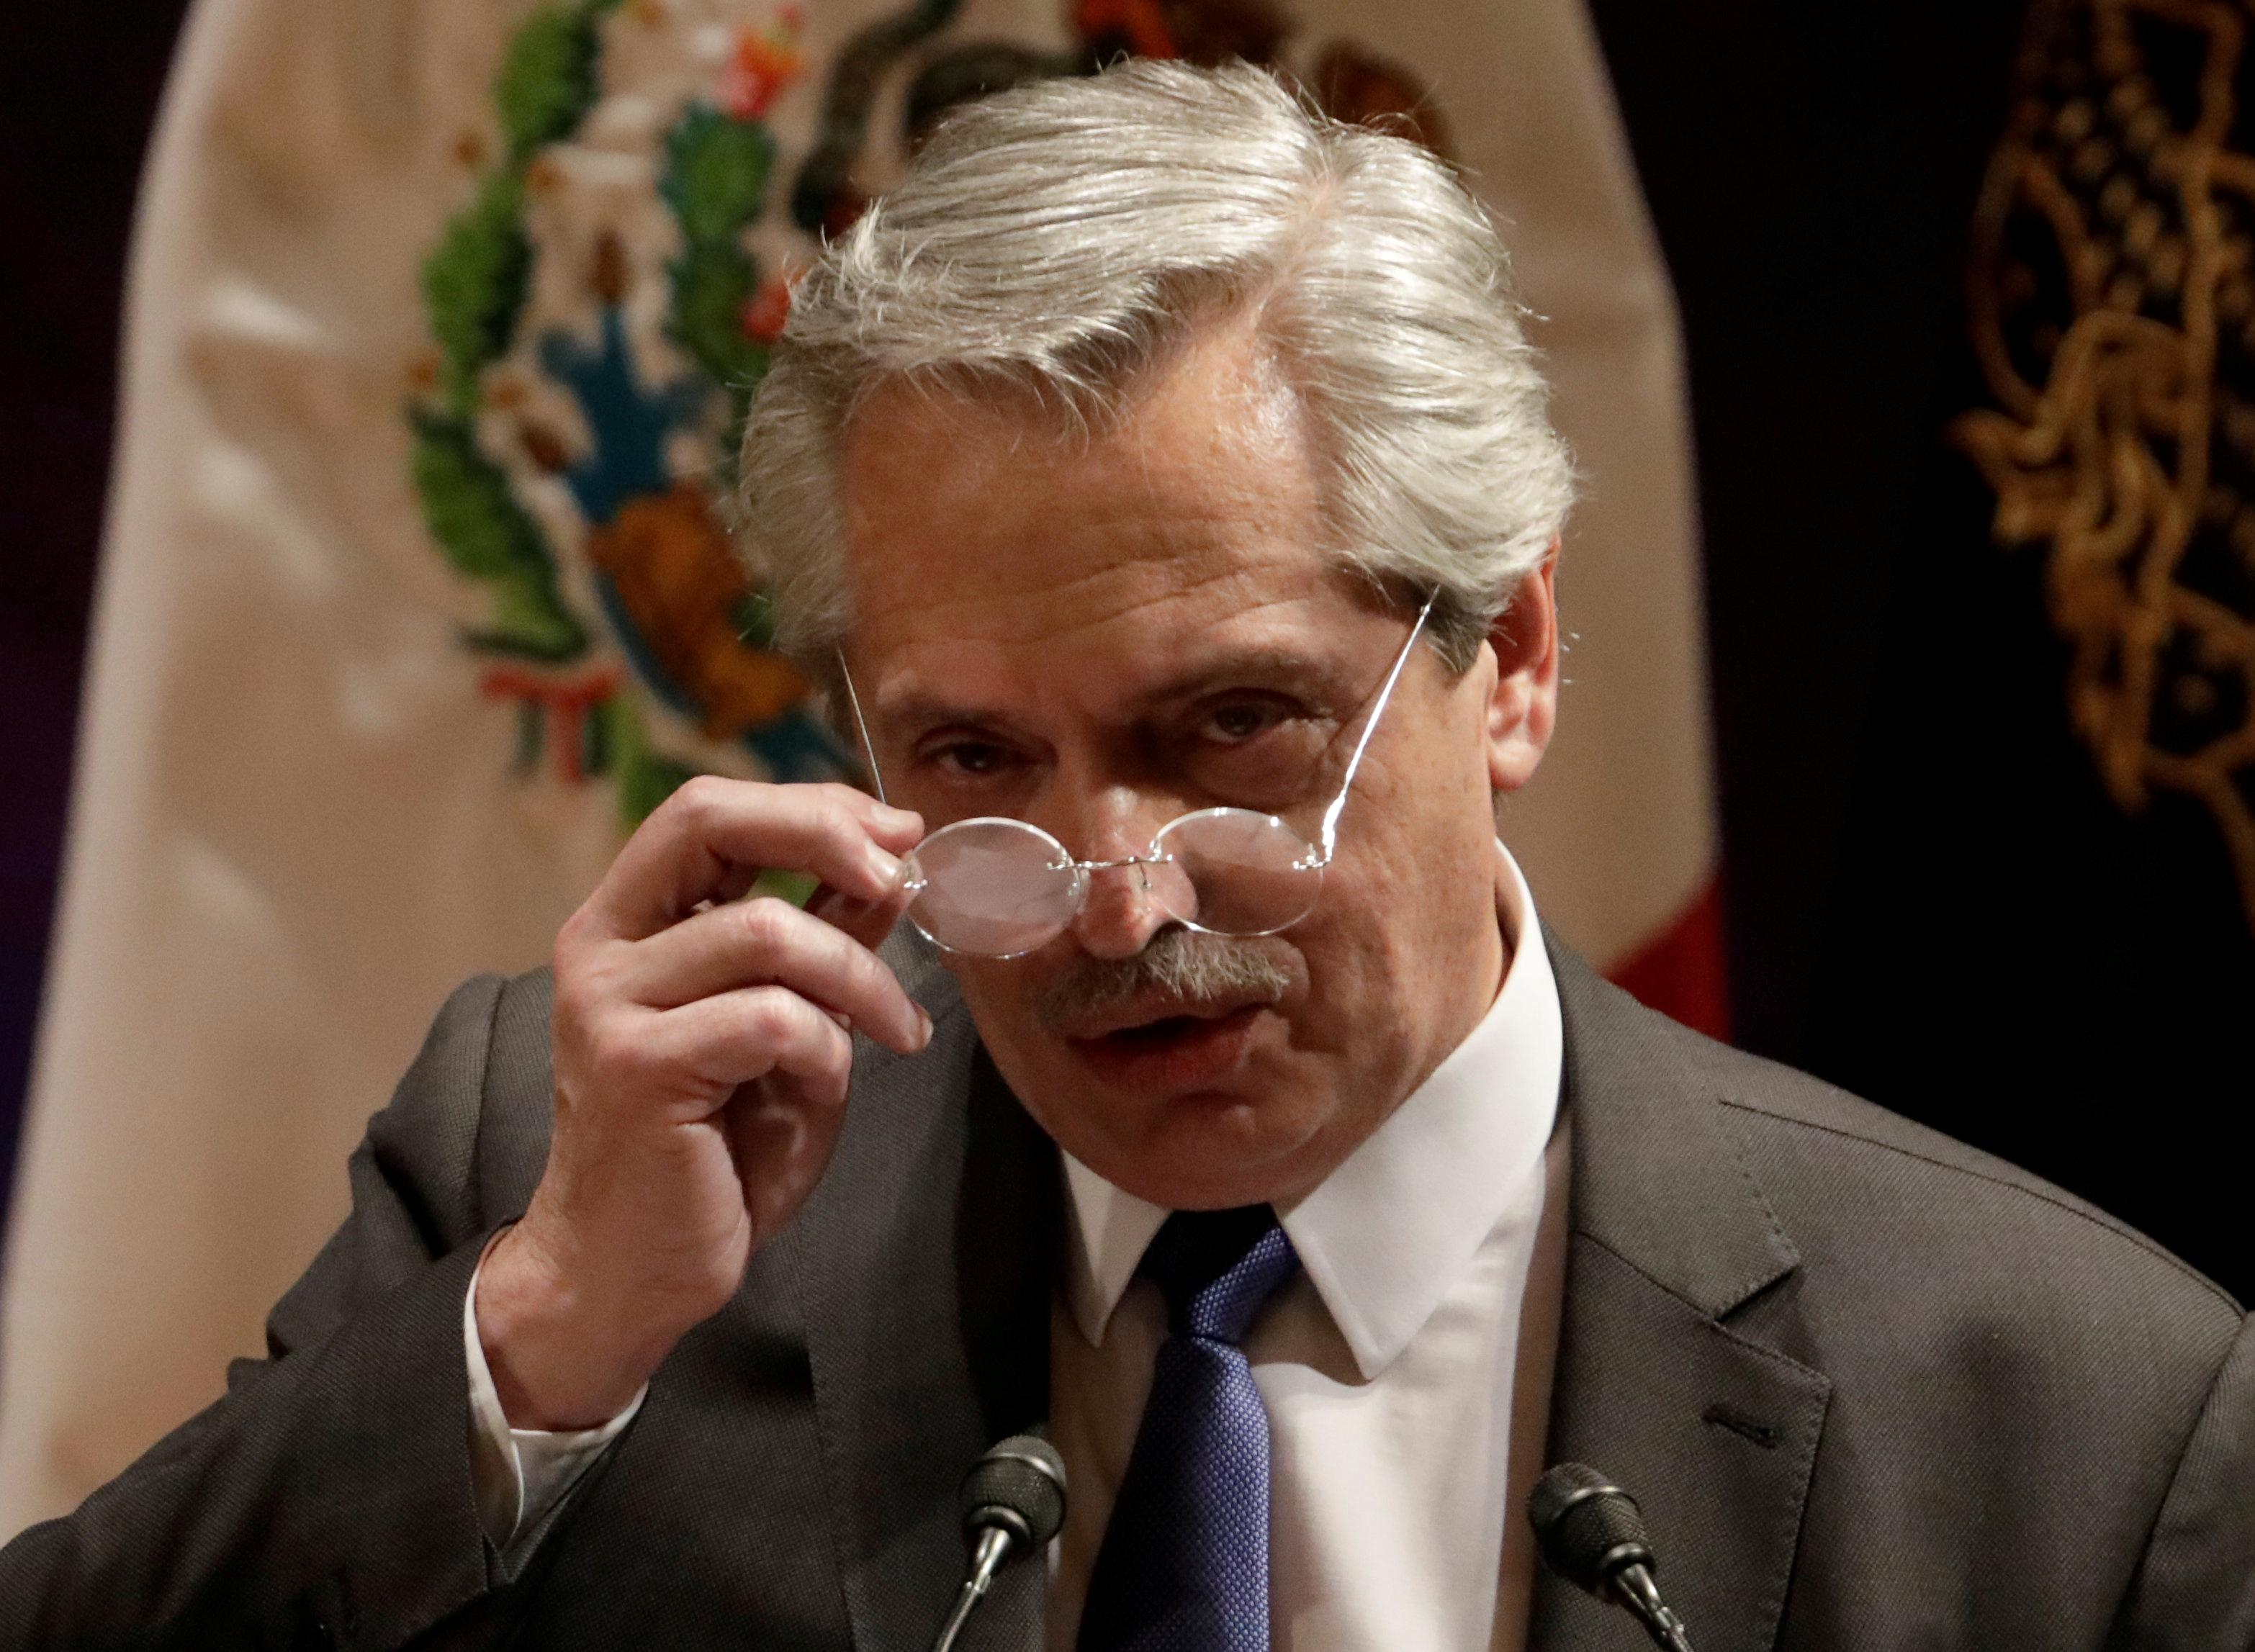 Argentine President-elect slams U.S. over Bolivia stance